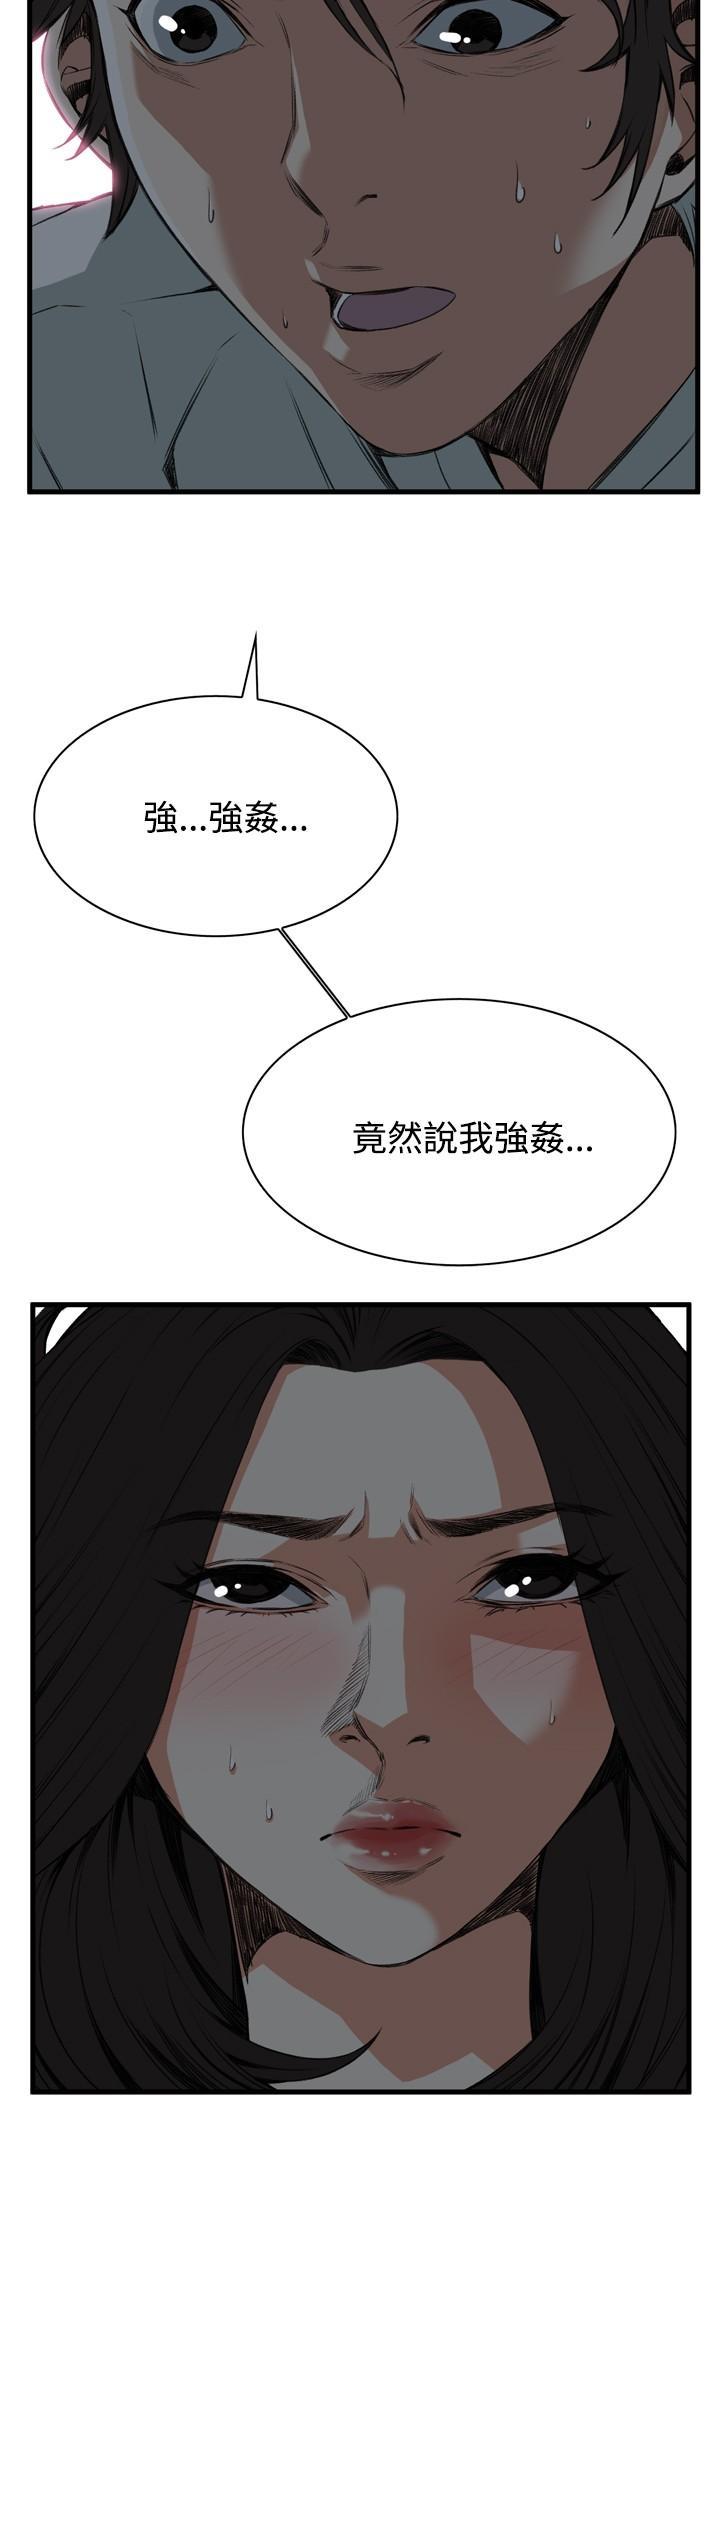 Take a Peek 偷窥 Ch.39~60 [Chinese]中文 198